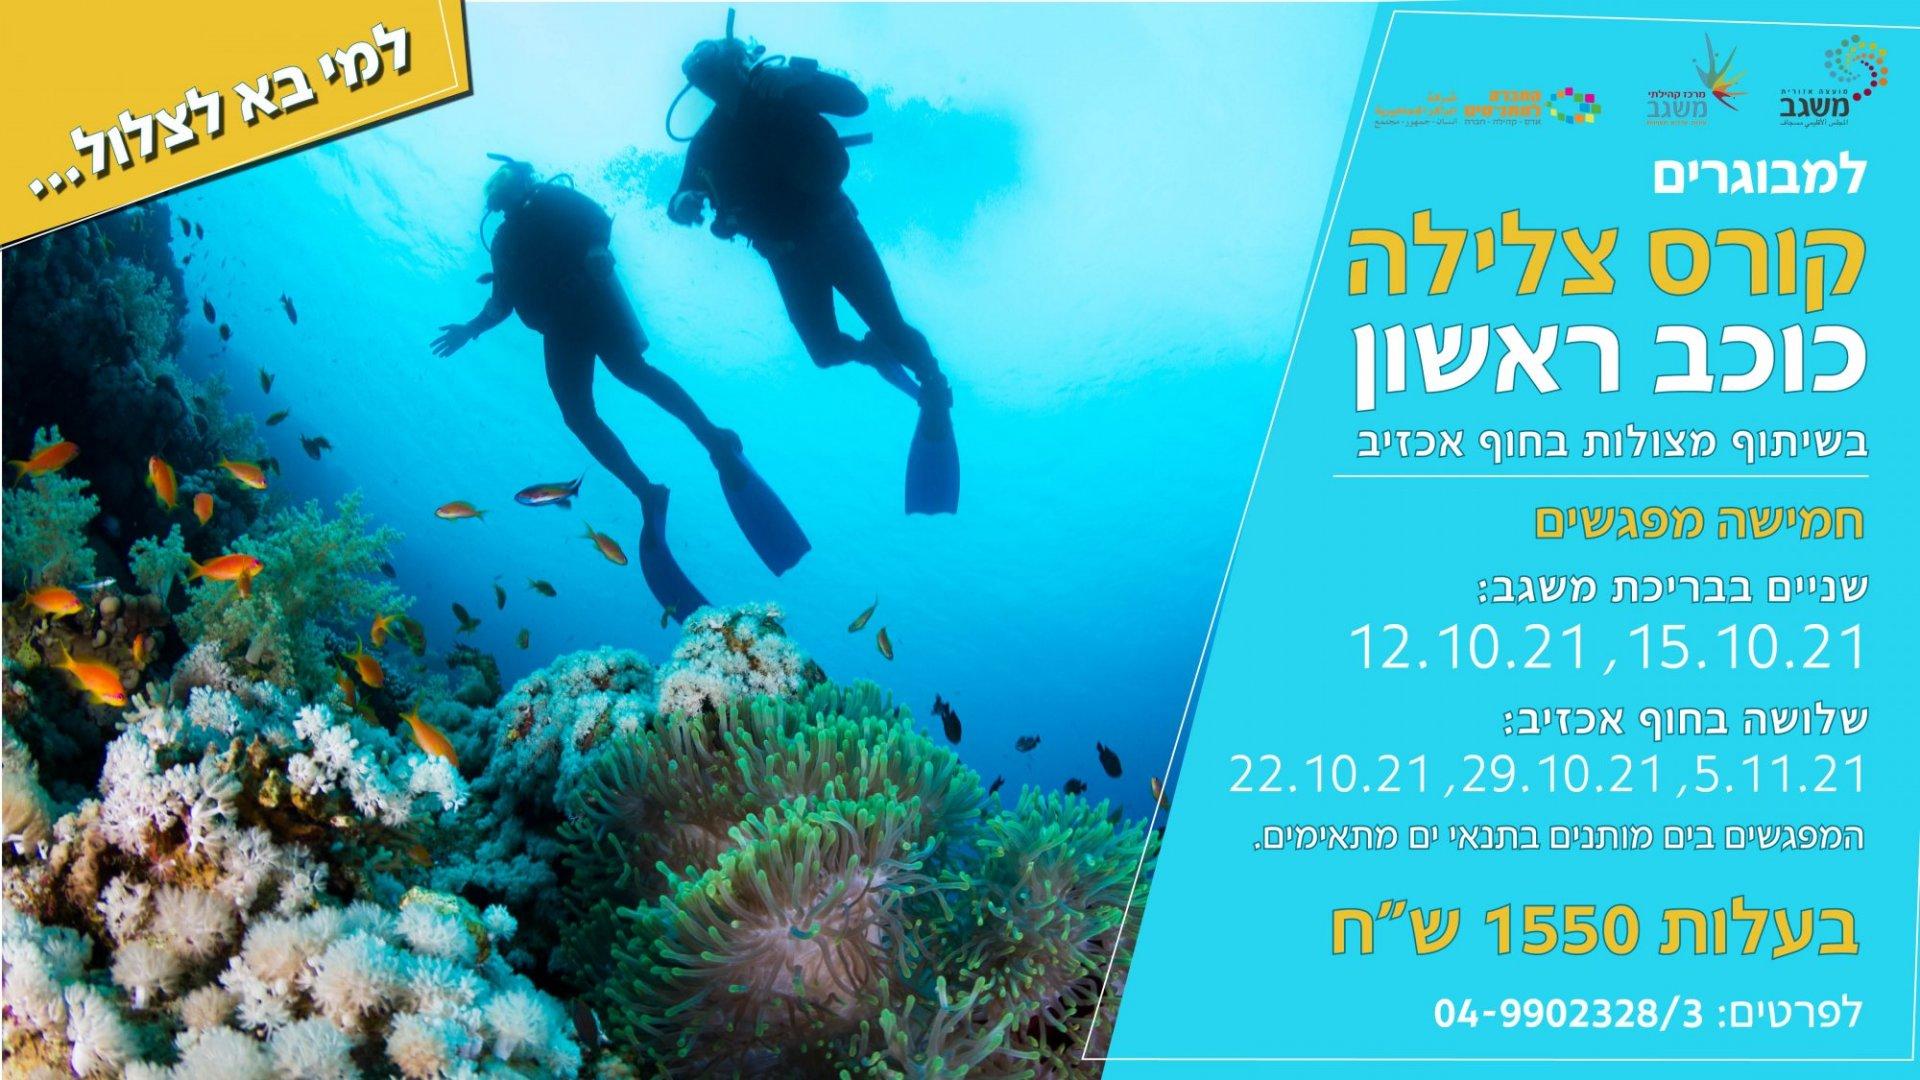 Scuba diving - summer 2021-Club Screen - Adults